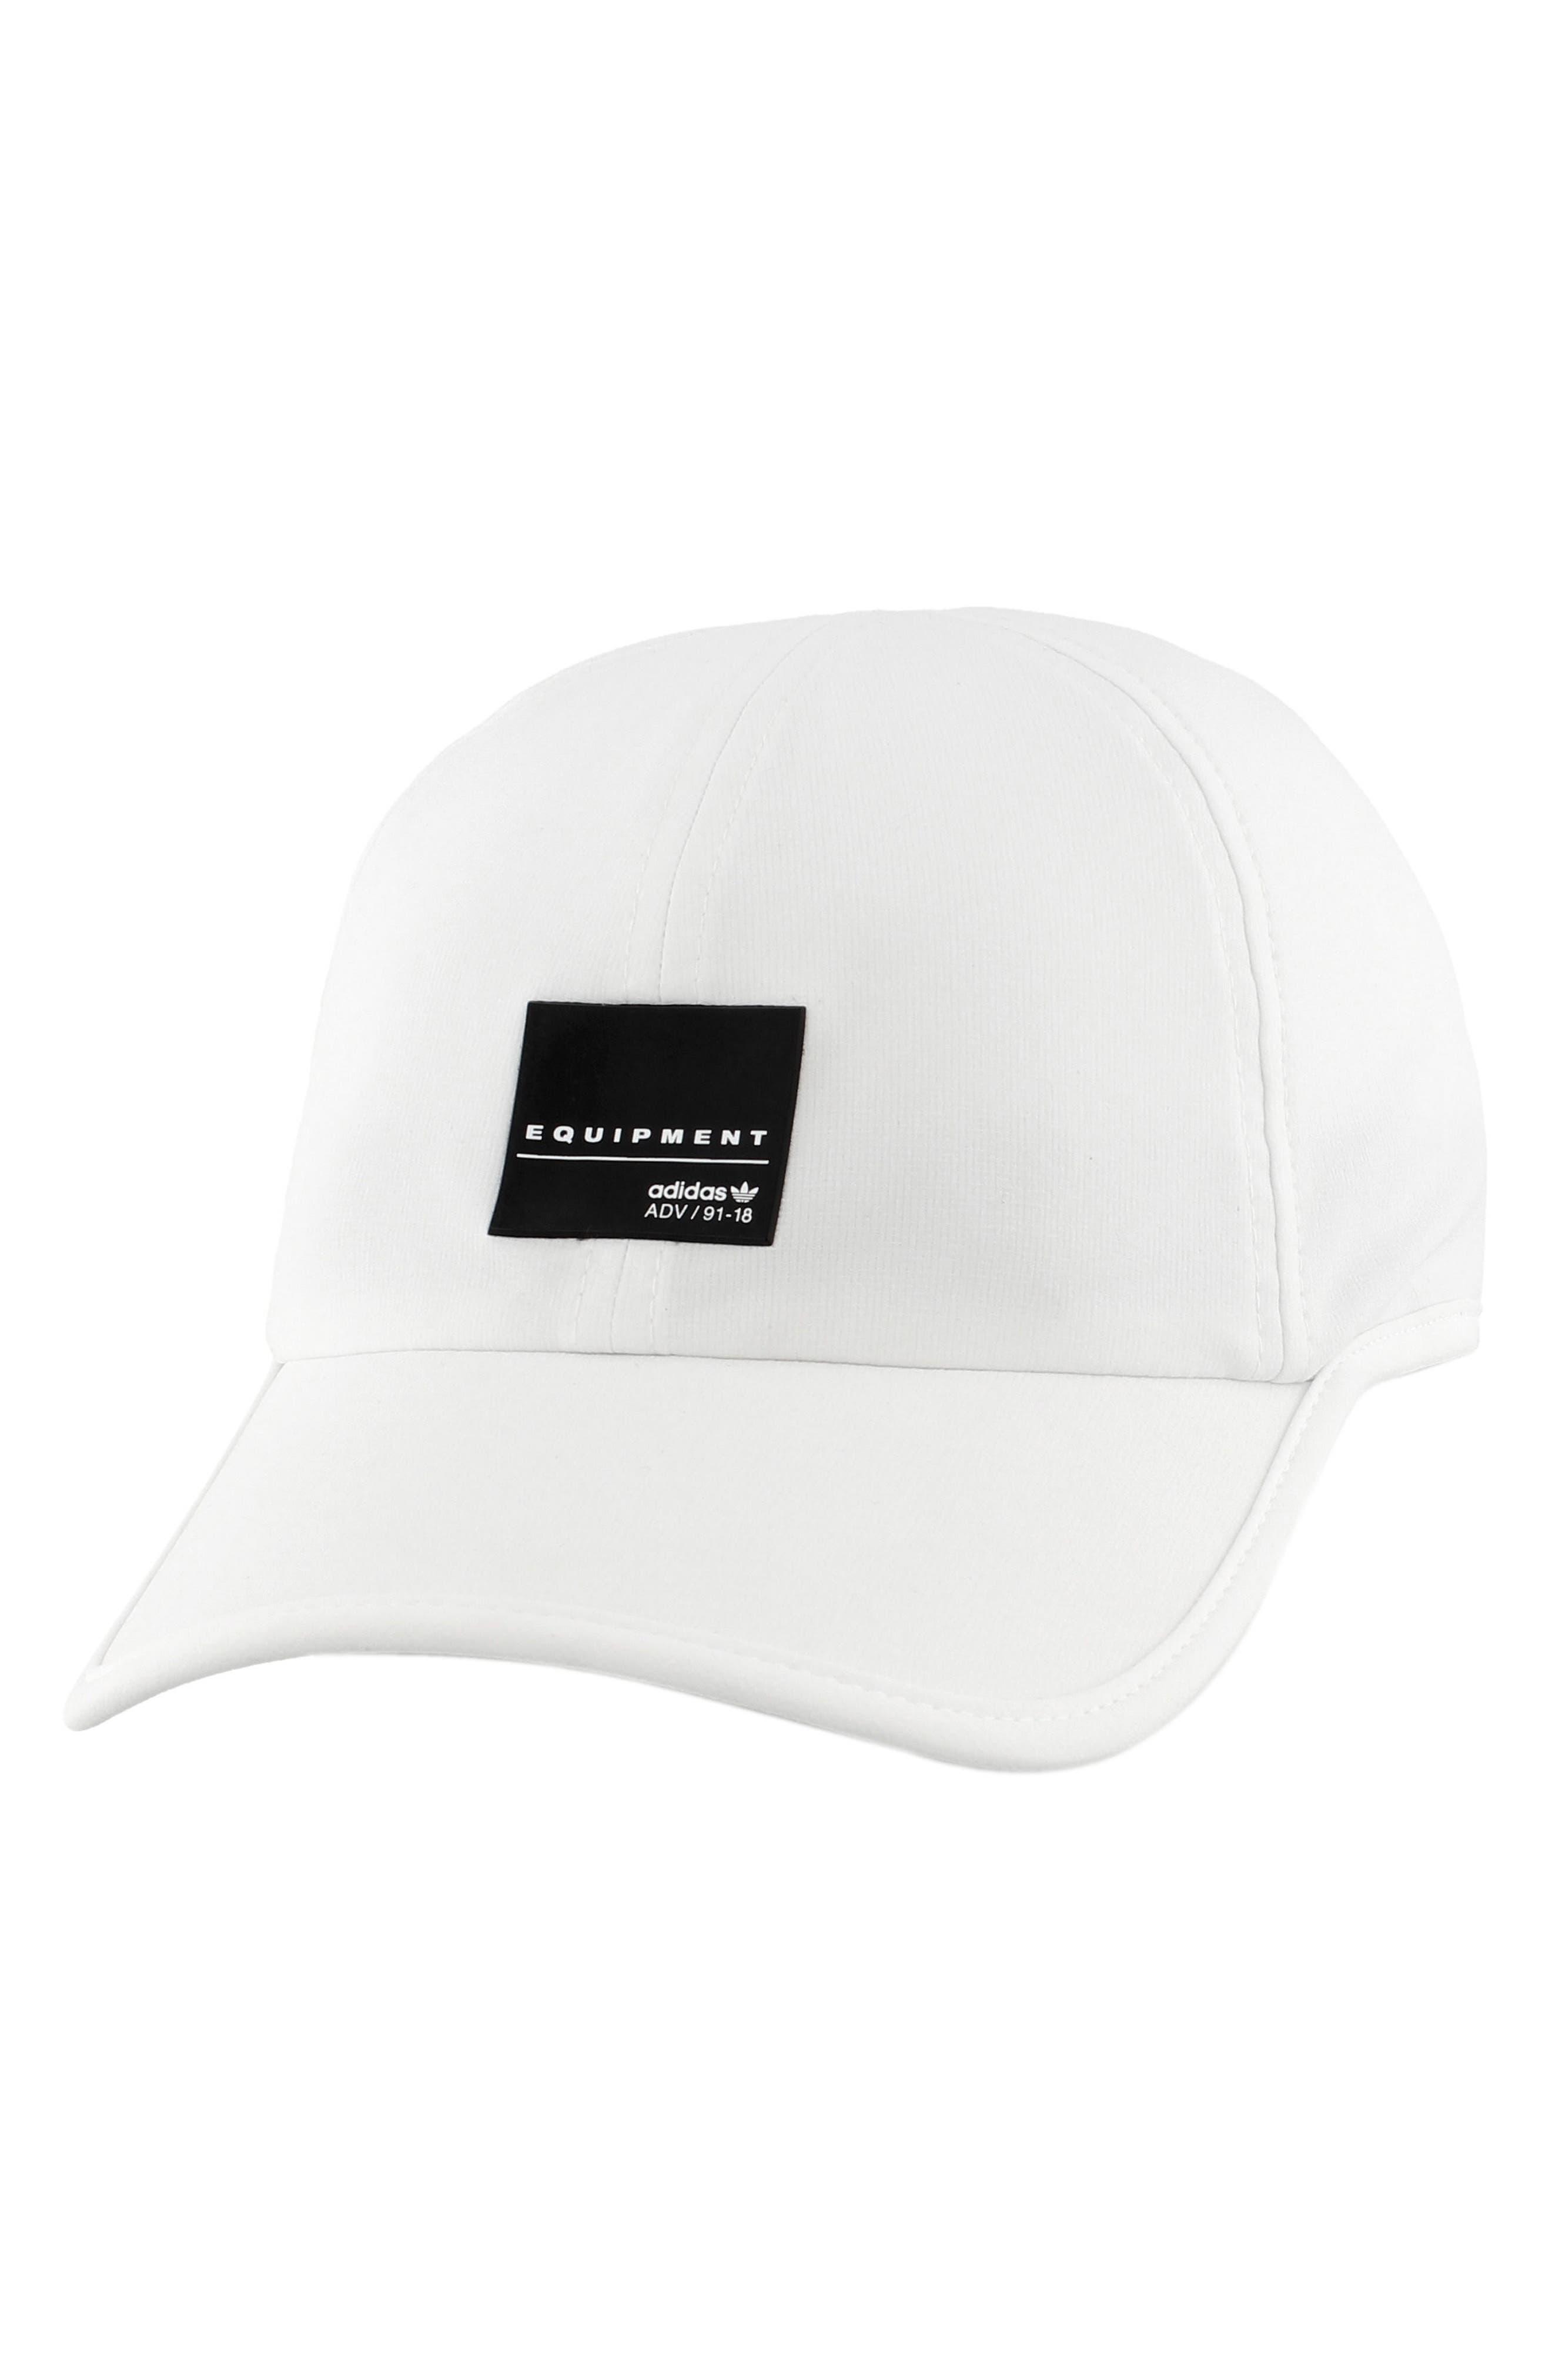 adidas Originals EQT Trainer Cap